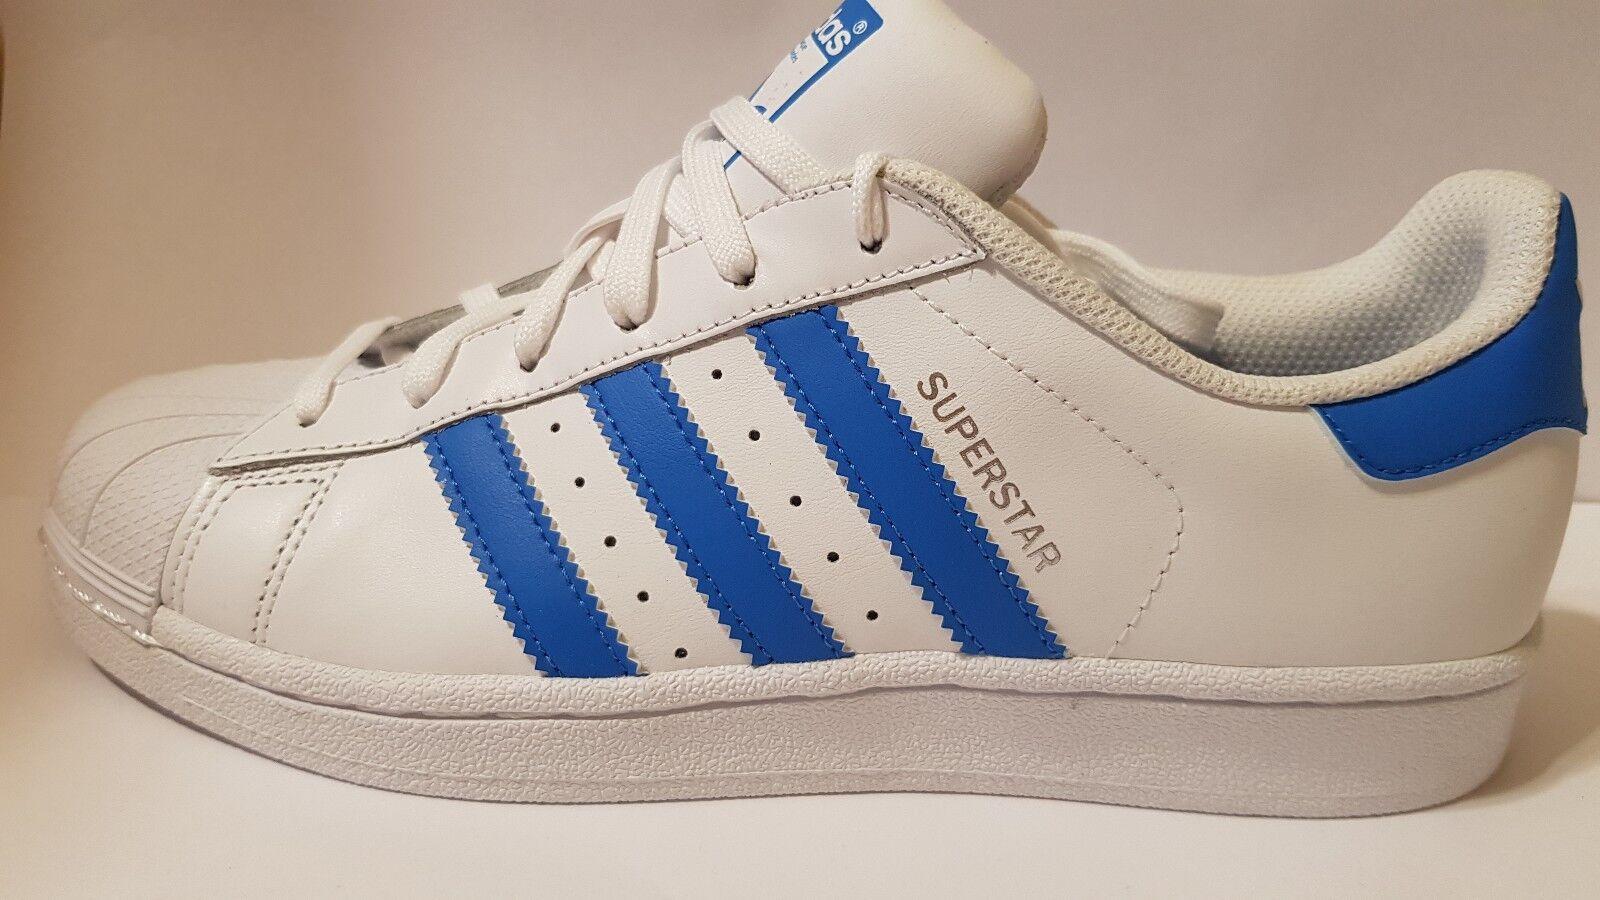 Adidas originals superstar s75929 turnschuhe schuhe skate board weiß - blau us7.5-11